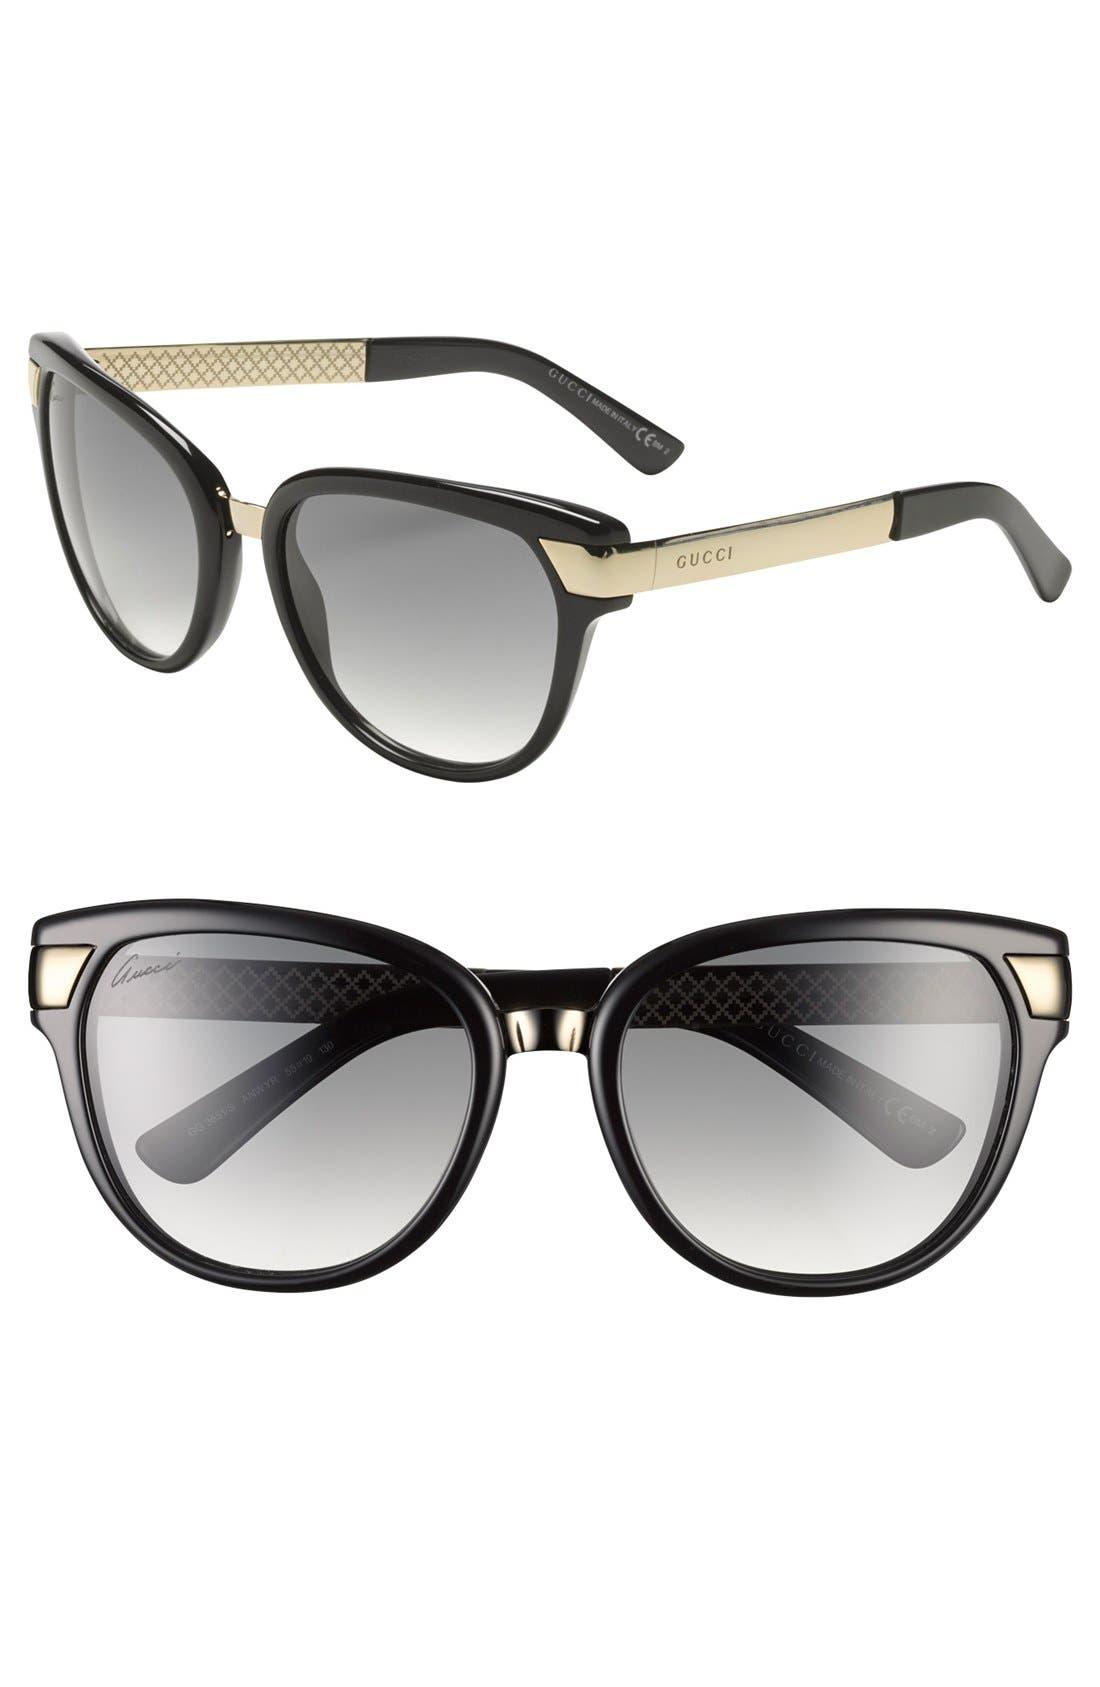 Main Image - Gucci 55mm Sunglasses